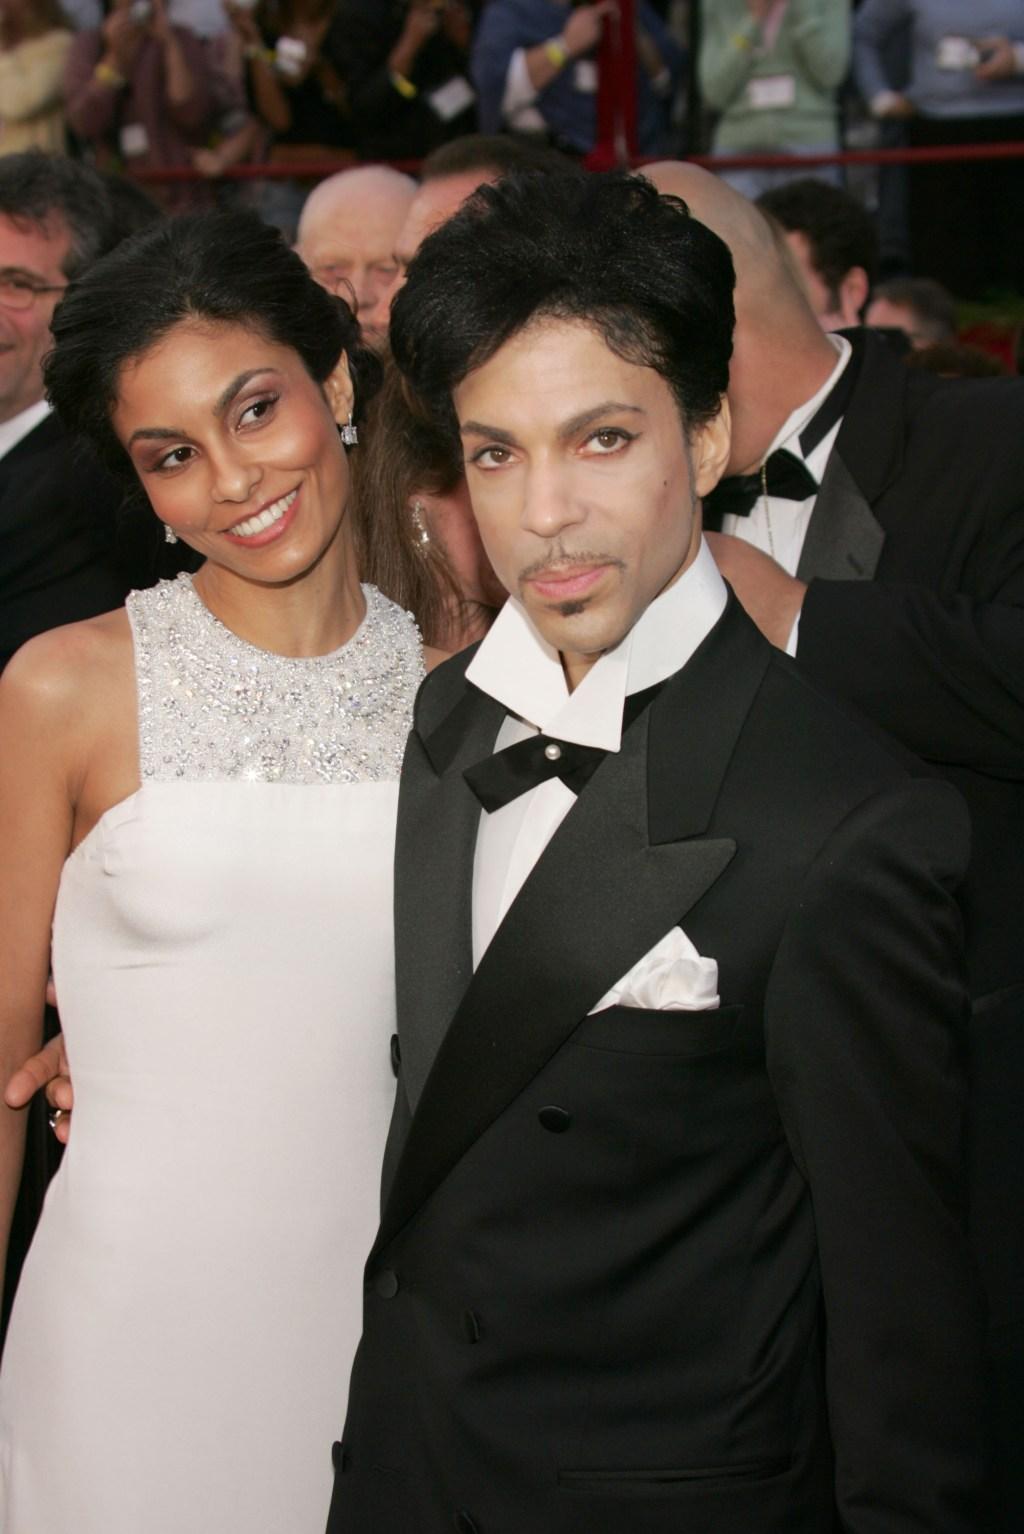 Prince con su segunda esposa, Manuela Testolini.